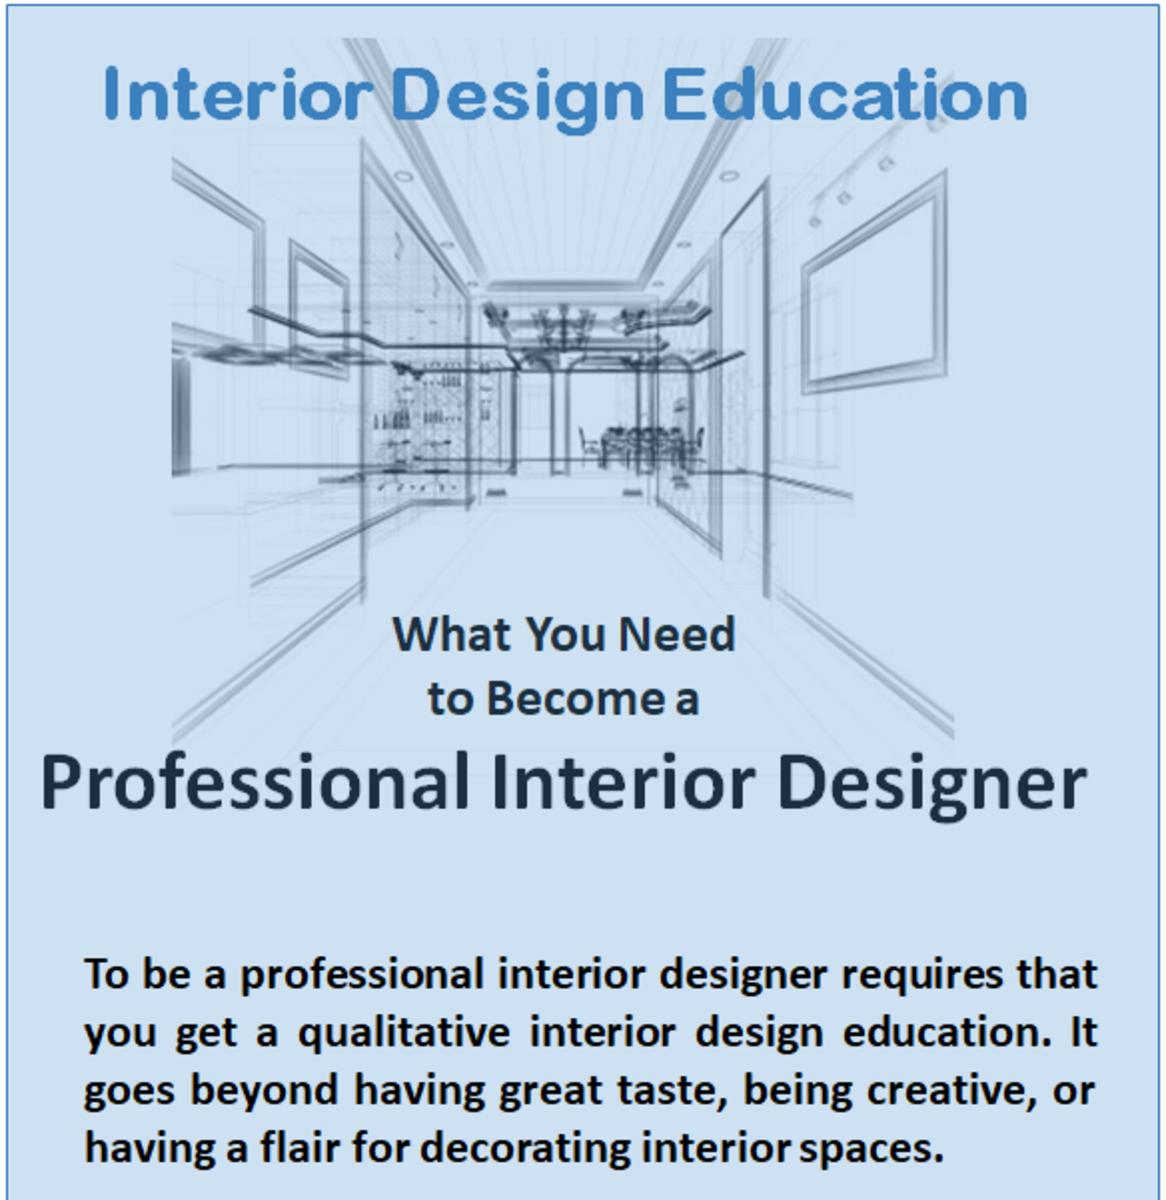 Interior design education minimum qualifications you need - How do you become an interior designer ...